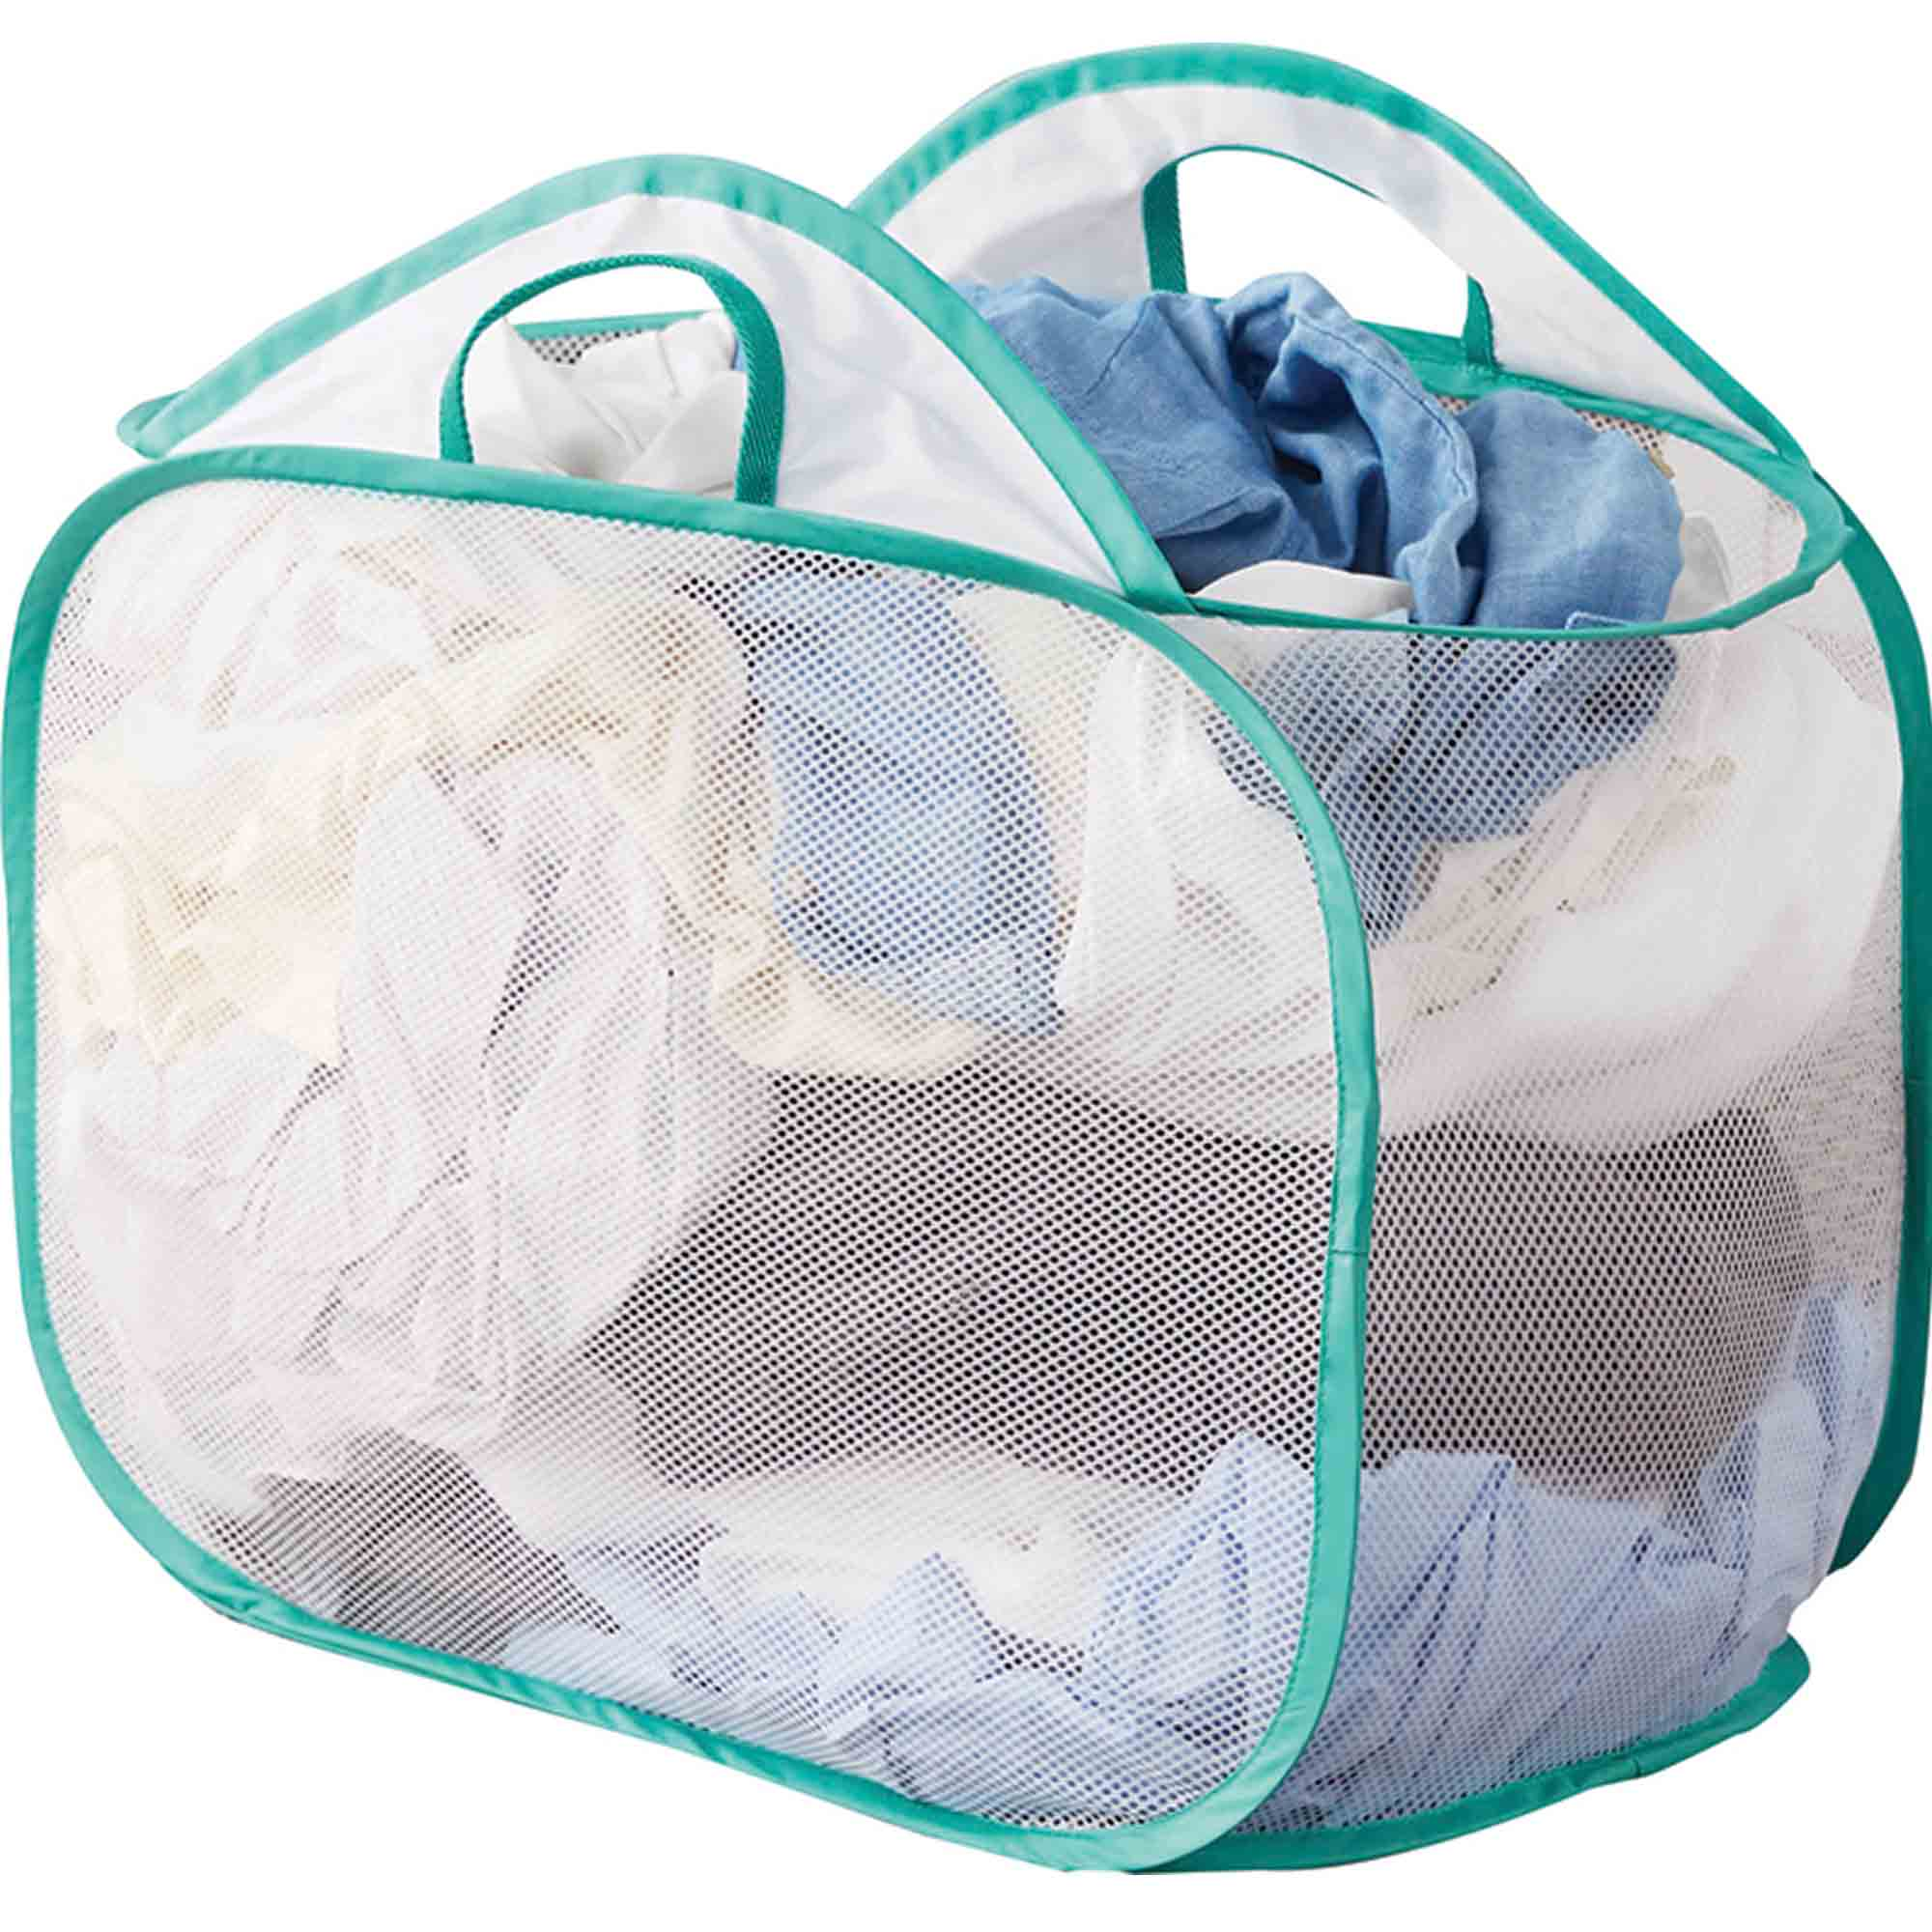 Mainstays White Mesh Pop Up Laundry